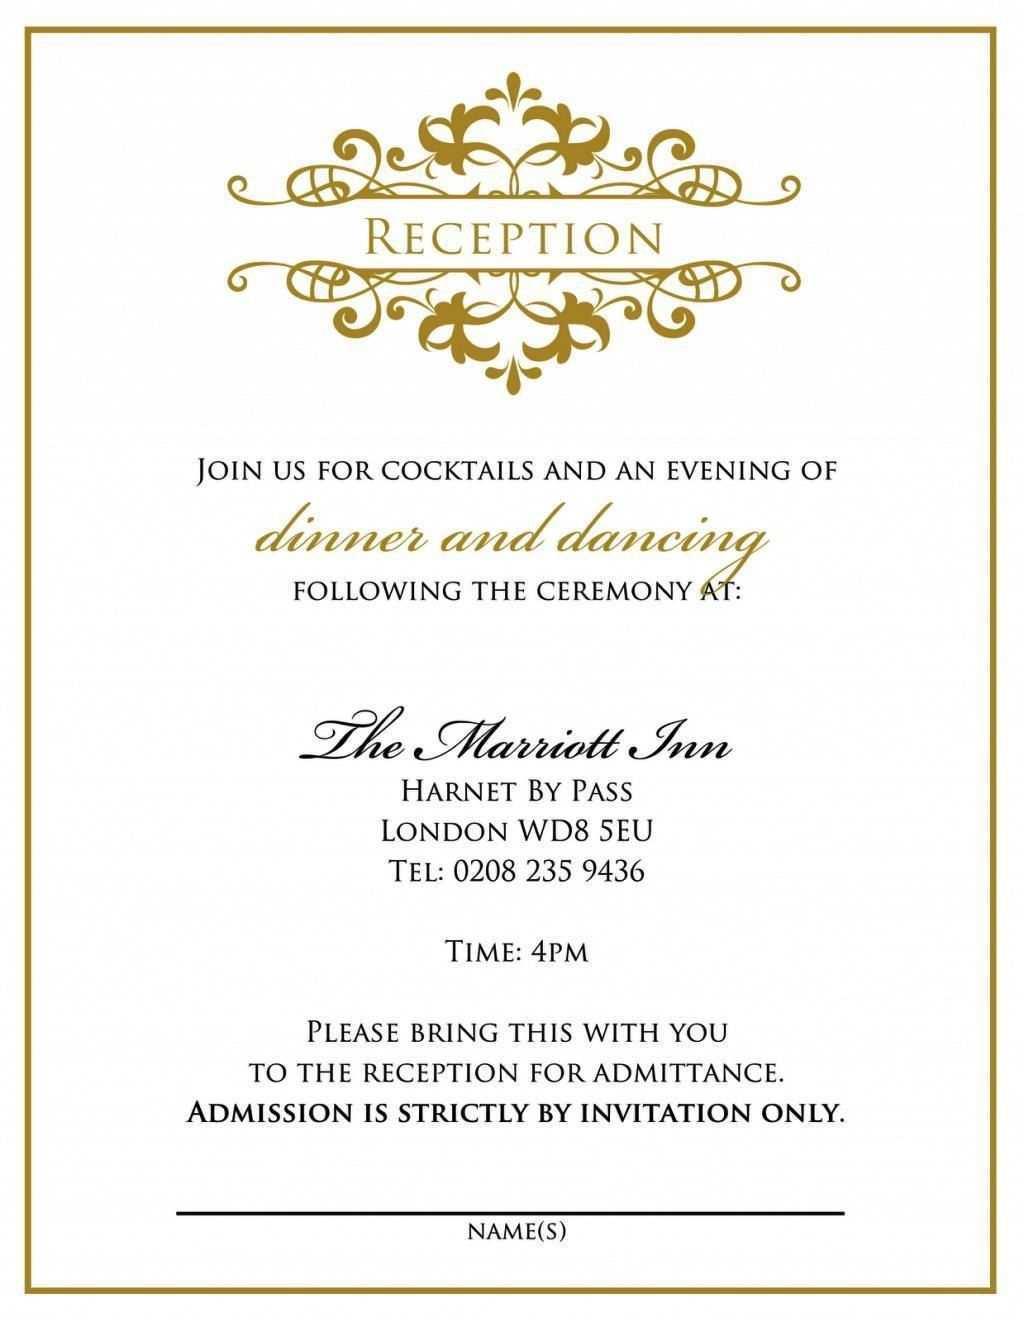 73 Create Wedding Dinner Invitation Text Message With Stunning Design with Wedding Dinner Invitation Text Message